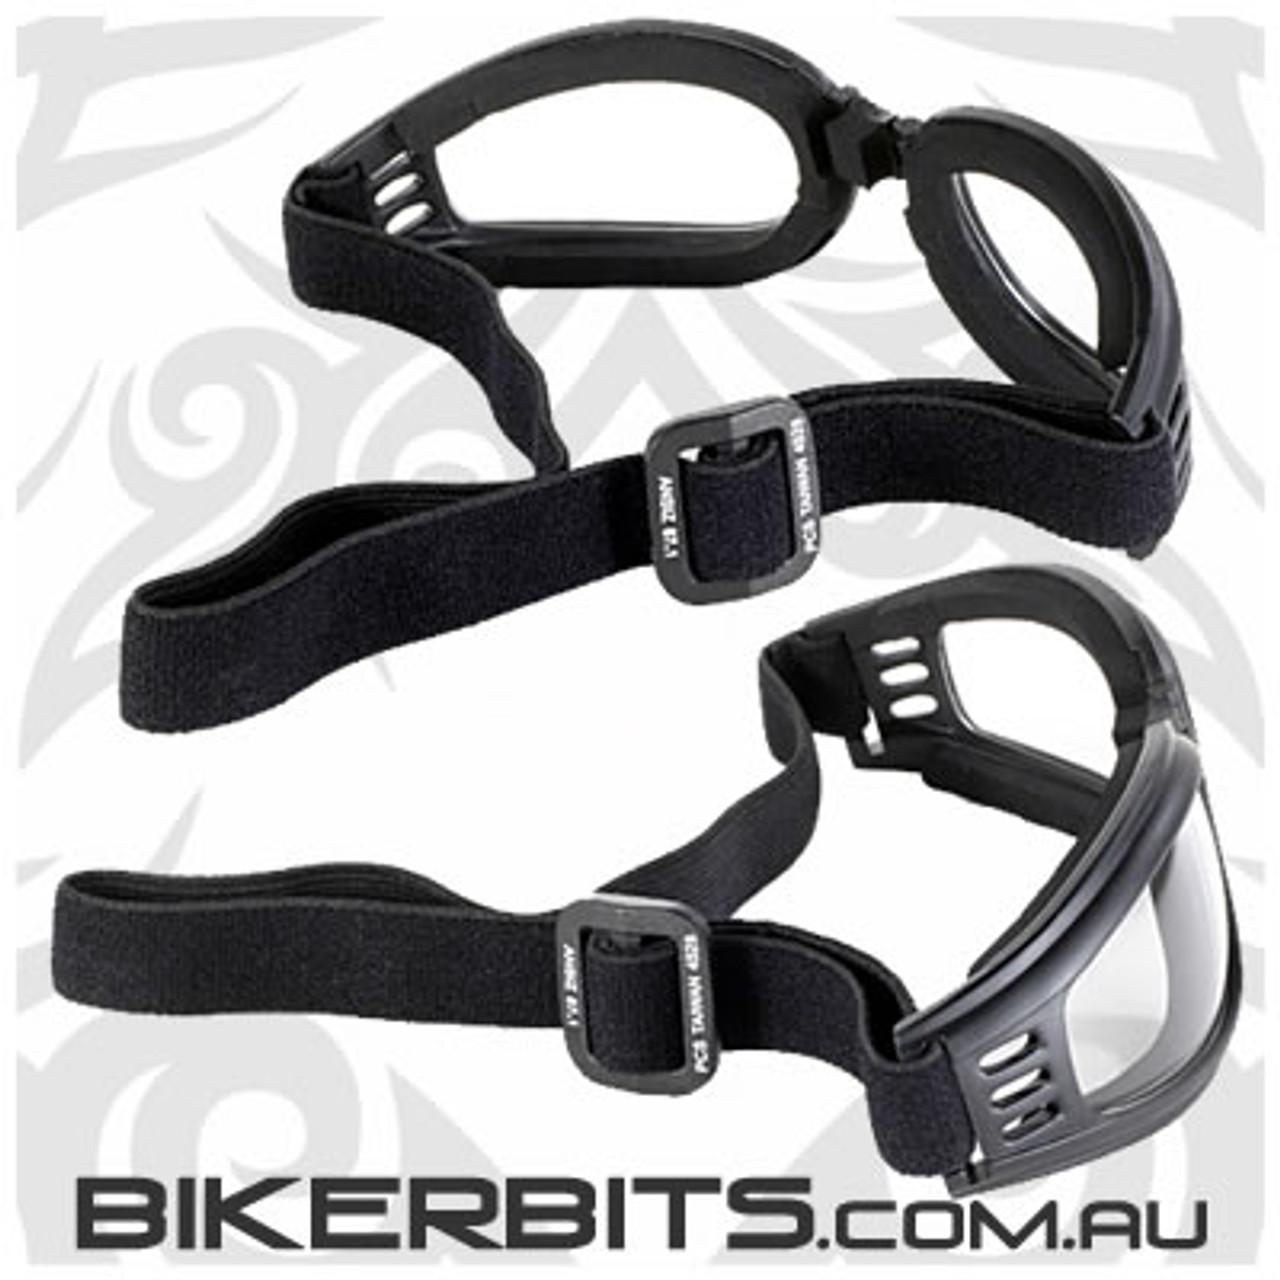 Motorcycle Goggles - Kickstart Nomad - Clear/Black